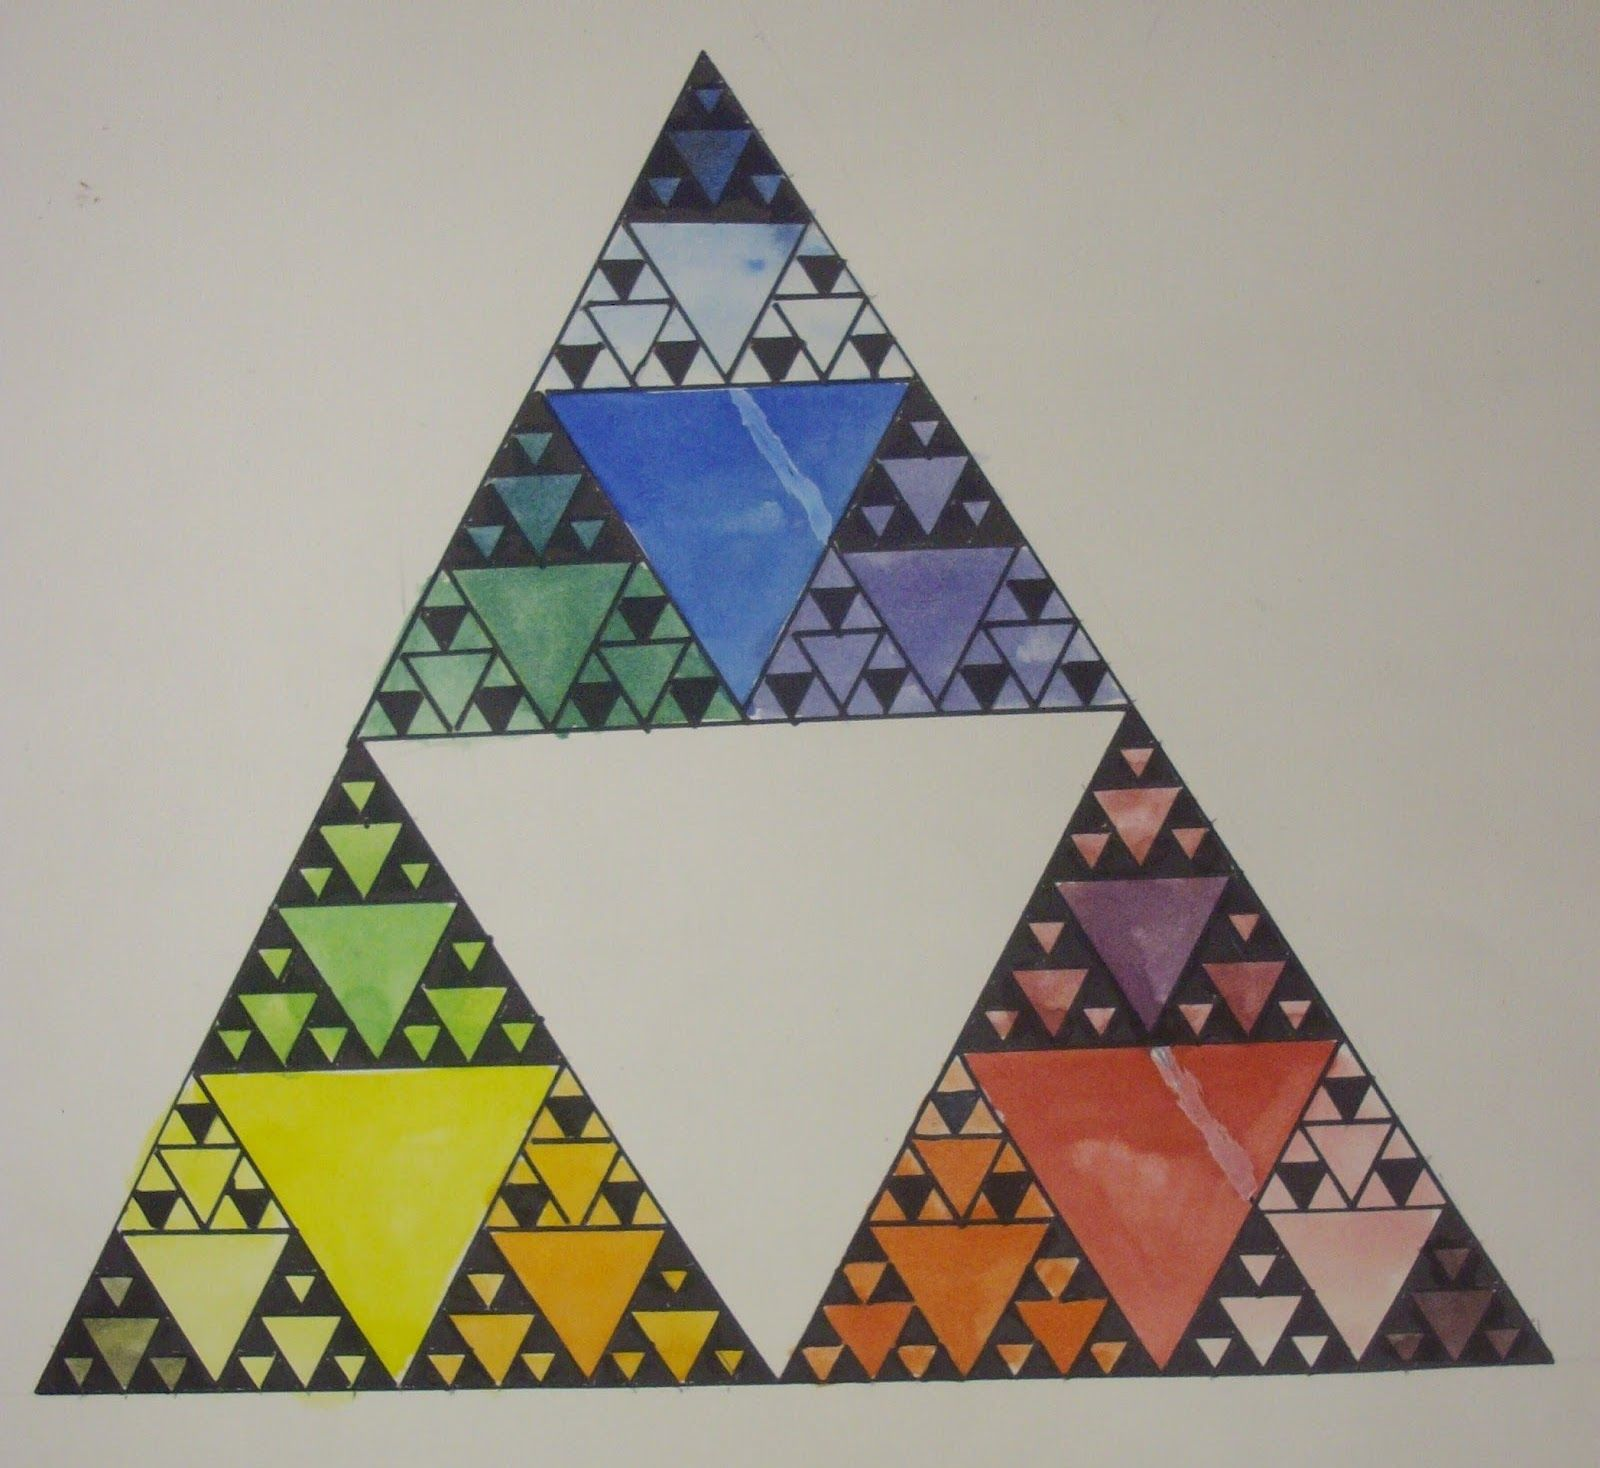 sierpinskis triangle colorwheel art integration – Sierpinski Triangle Worksheet